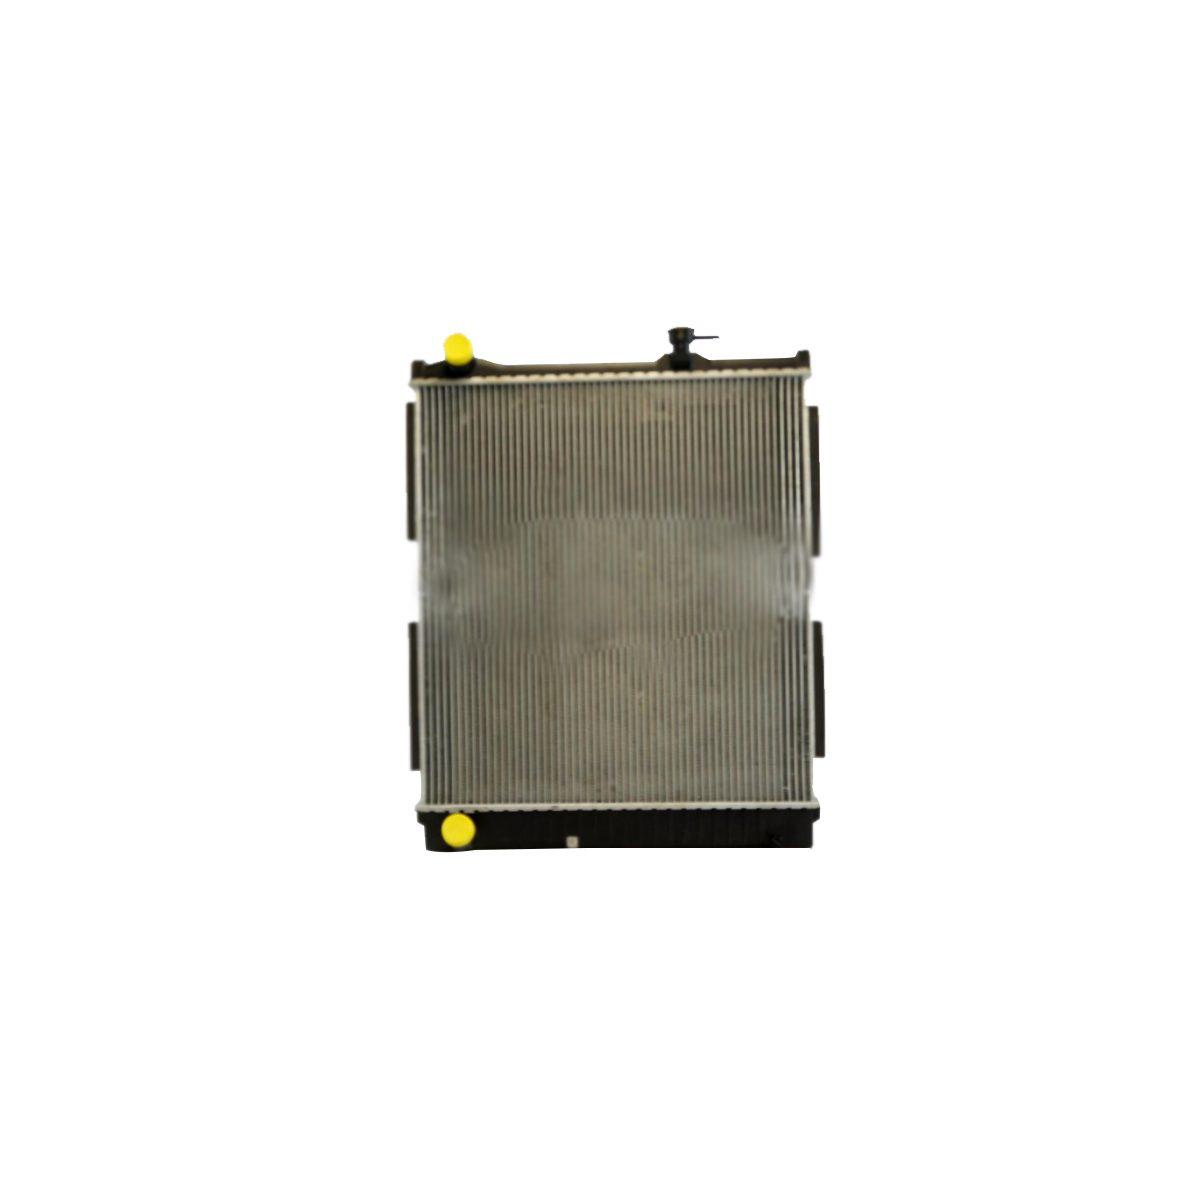 isuzu npr nqr series w diesel engine 99 04 radiator oem 5874107841